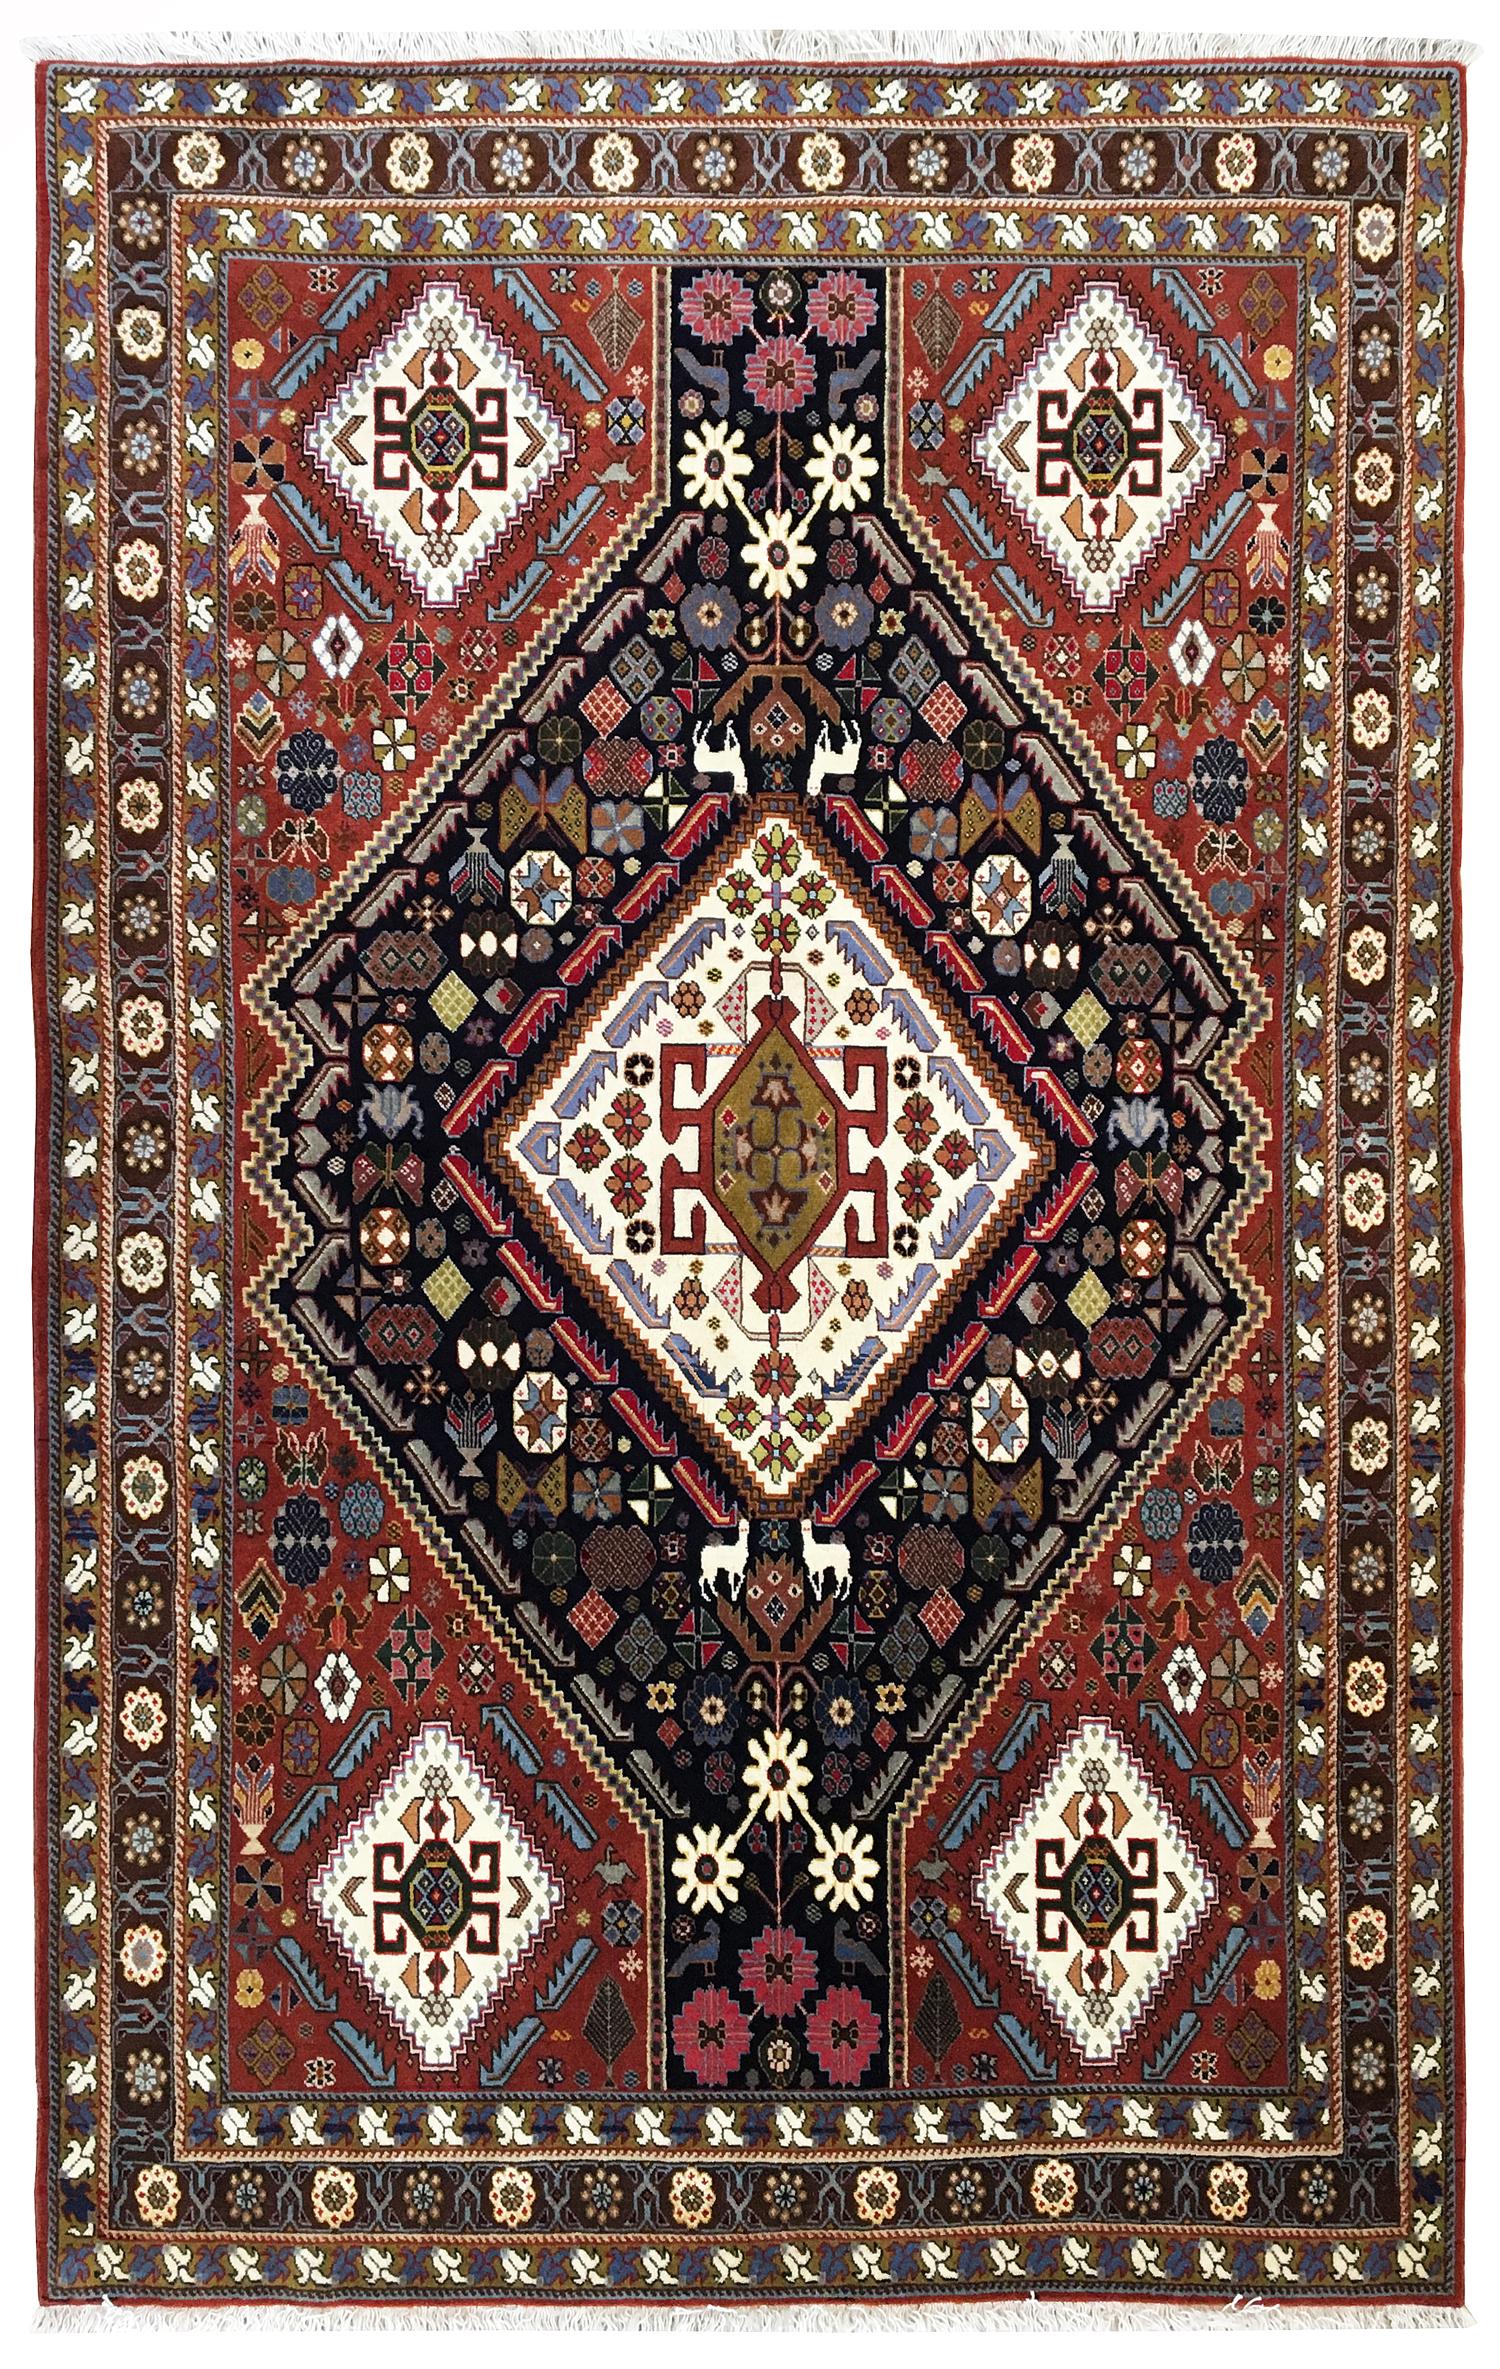 A-K_Persian_Qashquli_200cm_x_126cm_£3,250_01.jpg